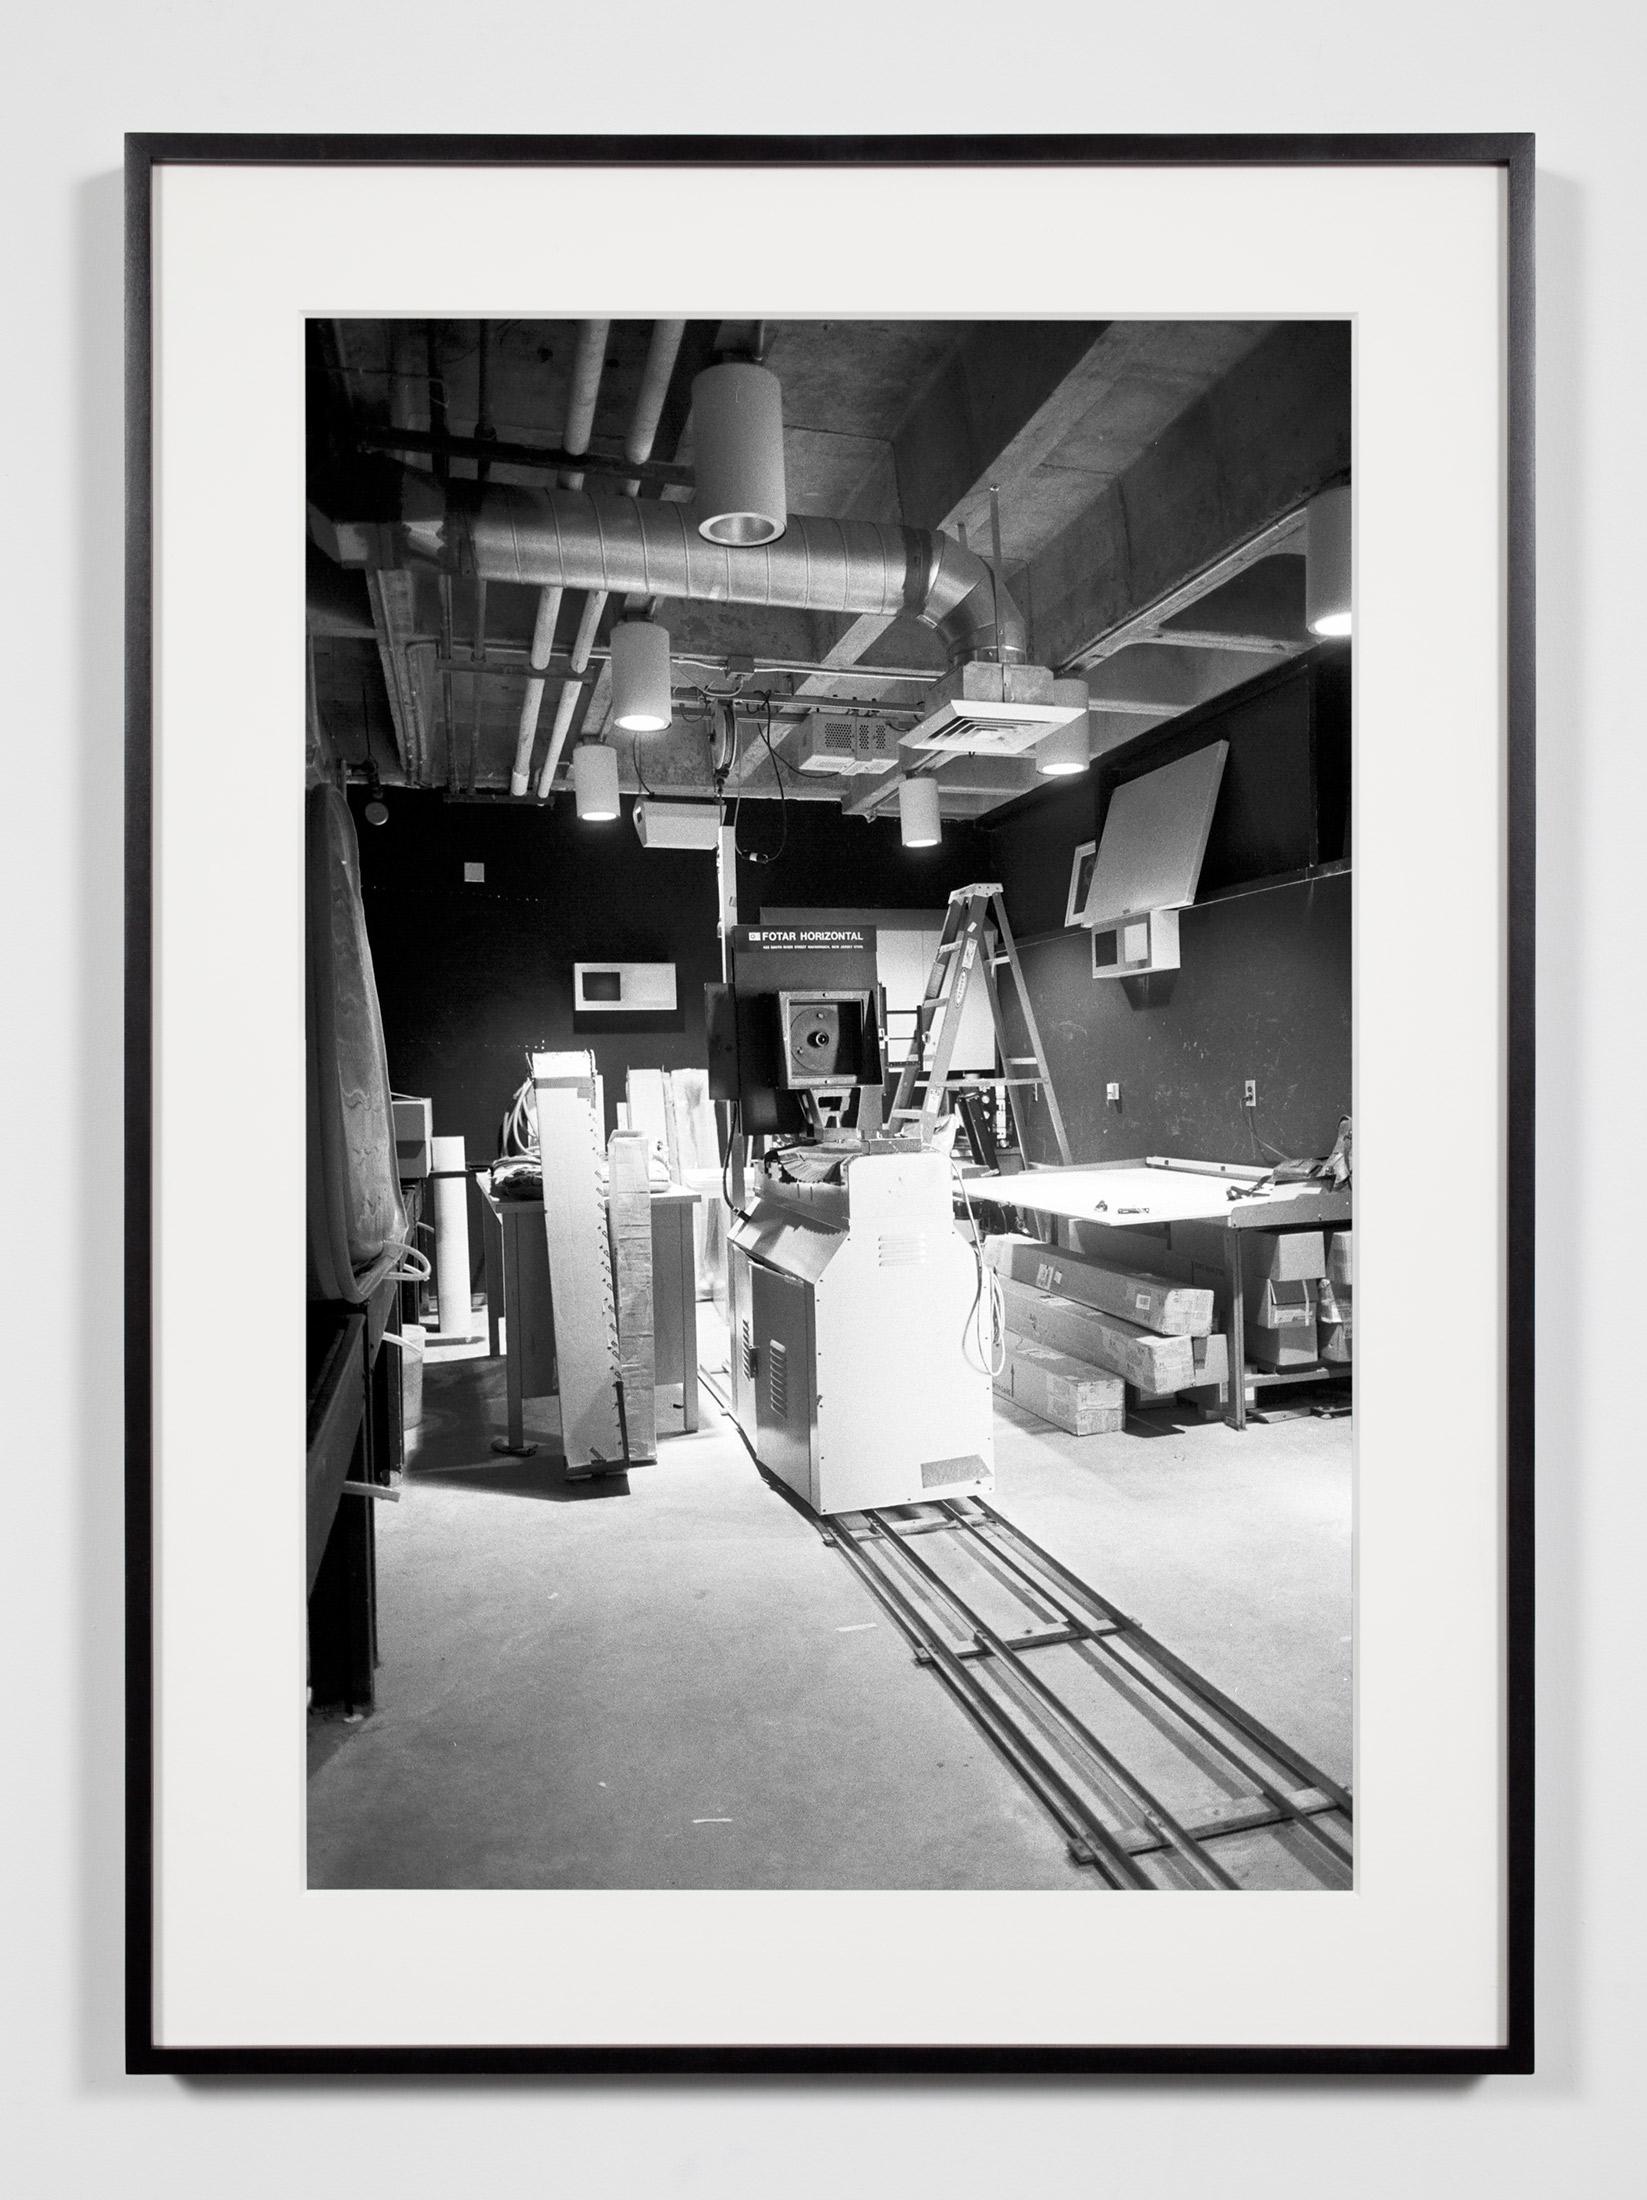 University Darkroom, 8 x 10 Horizontal Enlarger, Irvine, California, July 18, 2008    2011   Epson Ultrachrome K3 archival ink jet print on Hahnemühle Photo Rag paper  36 3/8 x 26 3/8 inches   Industrial Portraits, 2008–